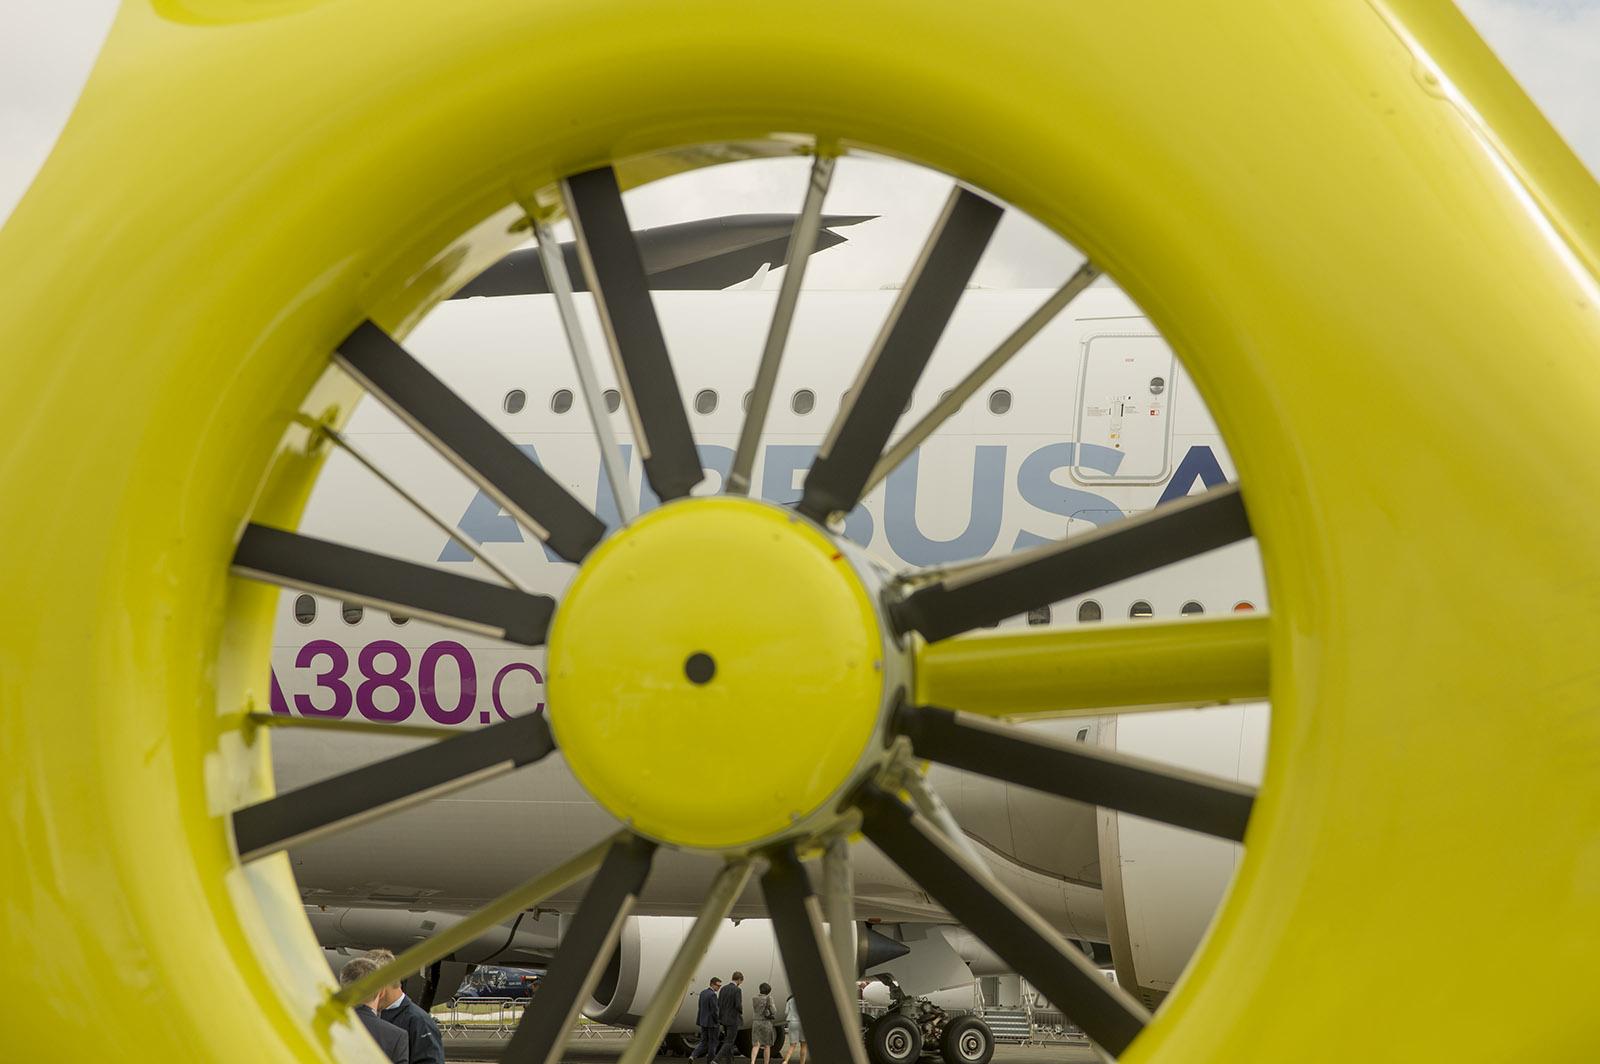 _IMG5470 Looking thru tailrotor at A380 s